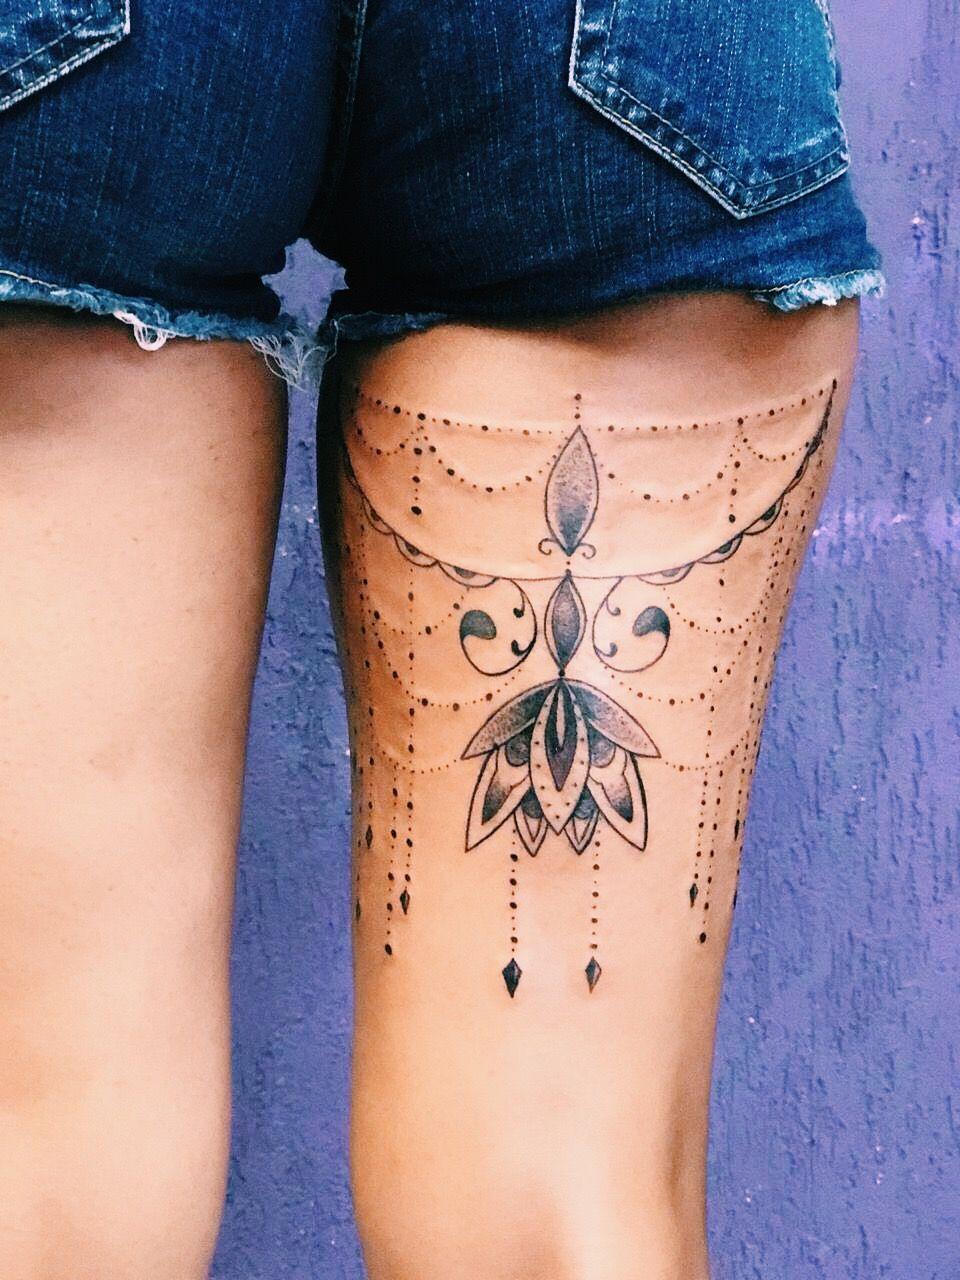 Tattoo Tatuagemfeminina Ink Ornamentaltattoo Back Of